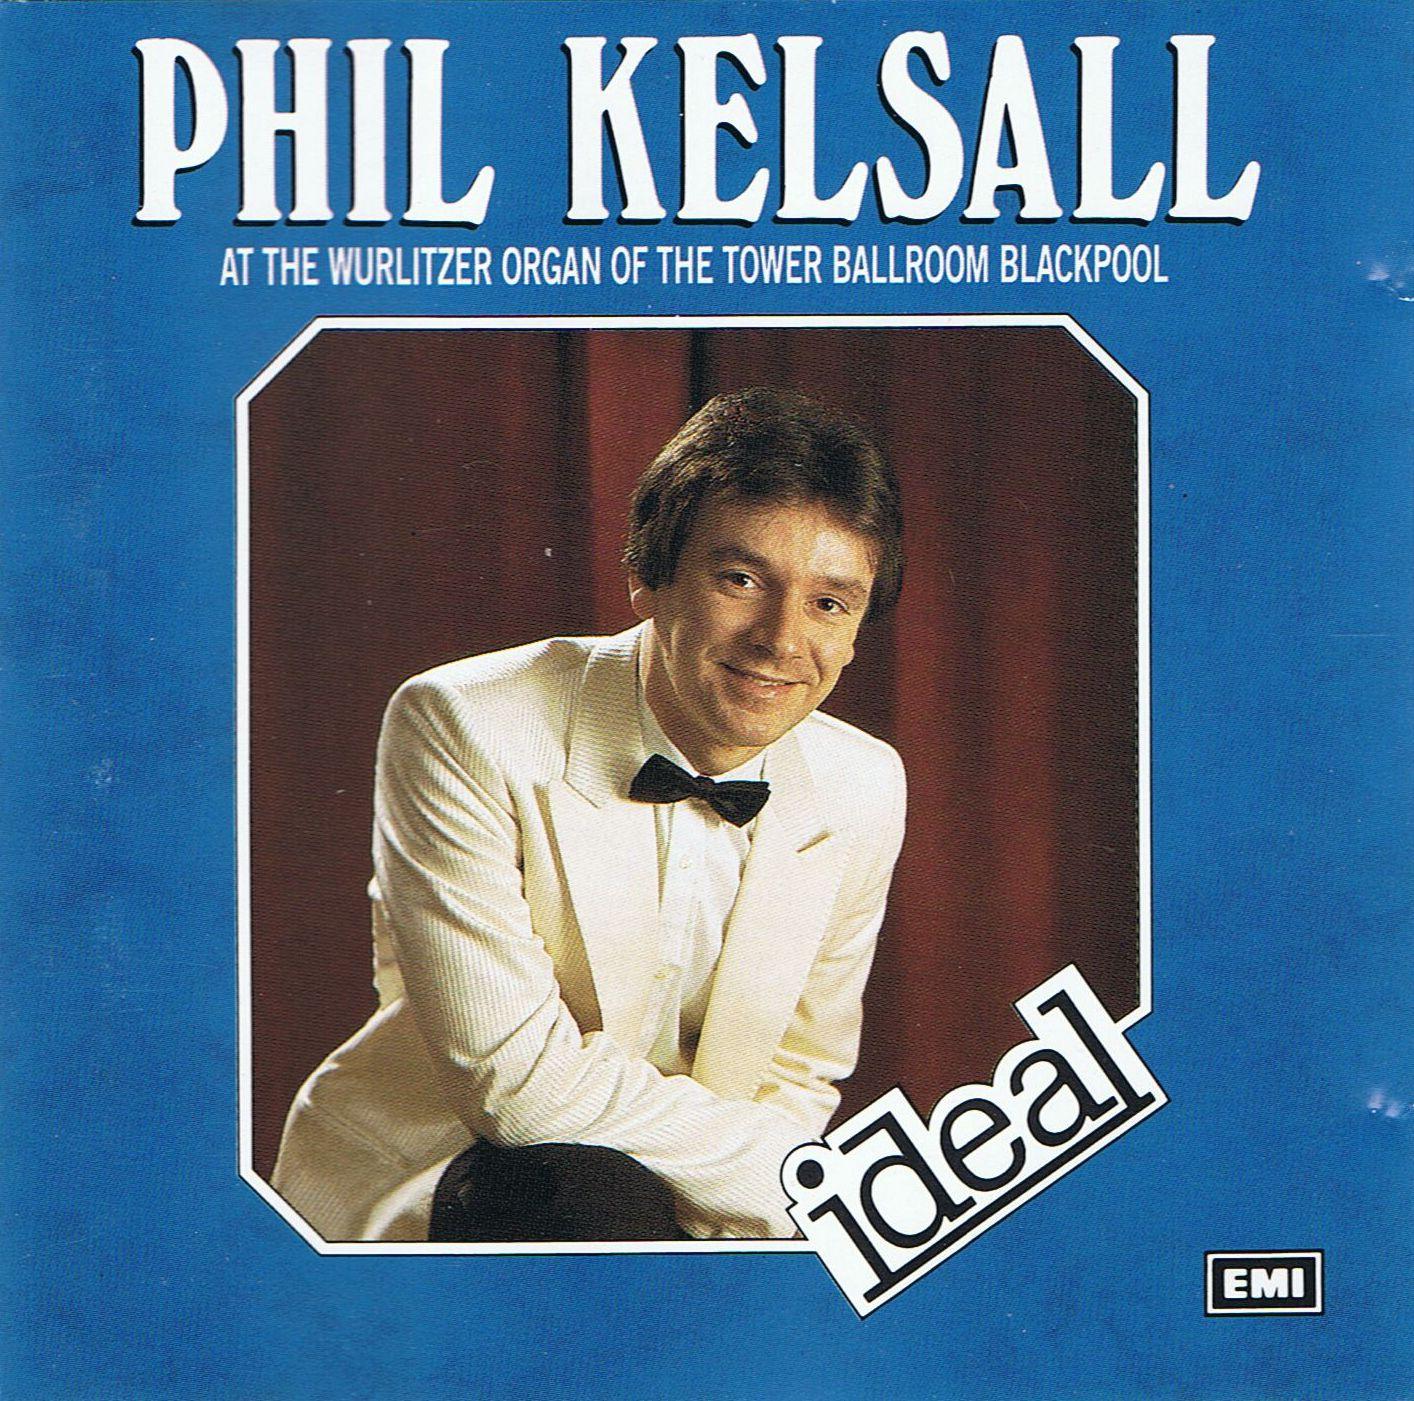 Phil Kelsall - Ideal